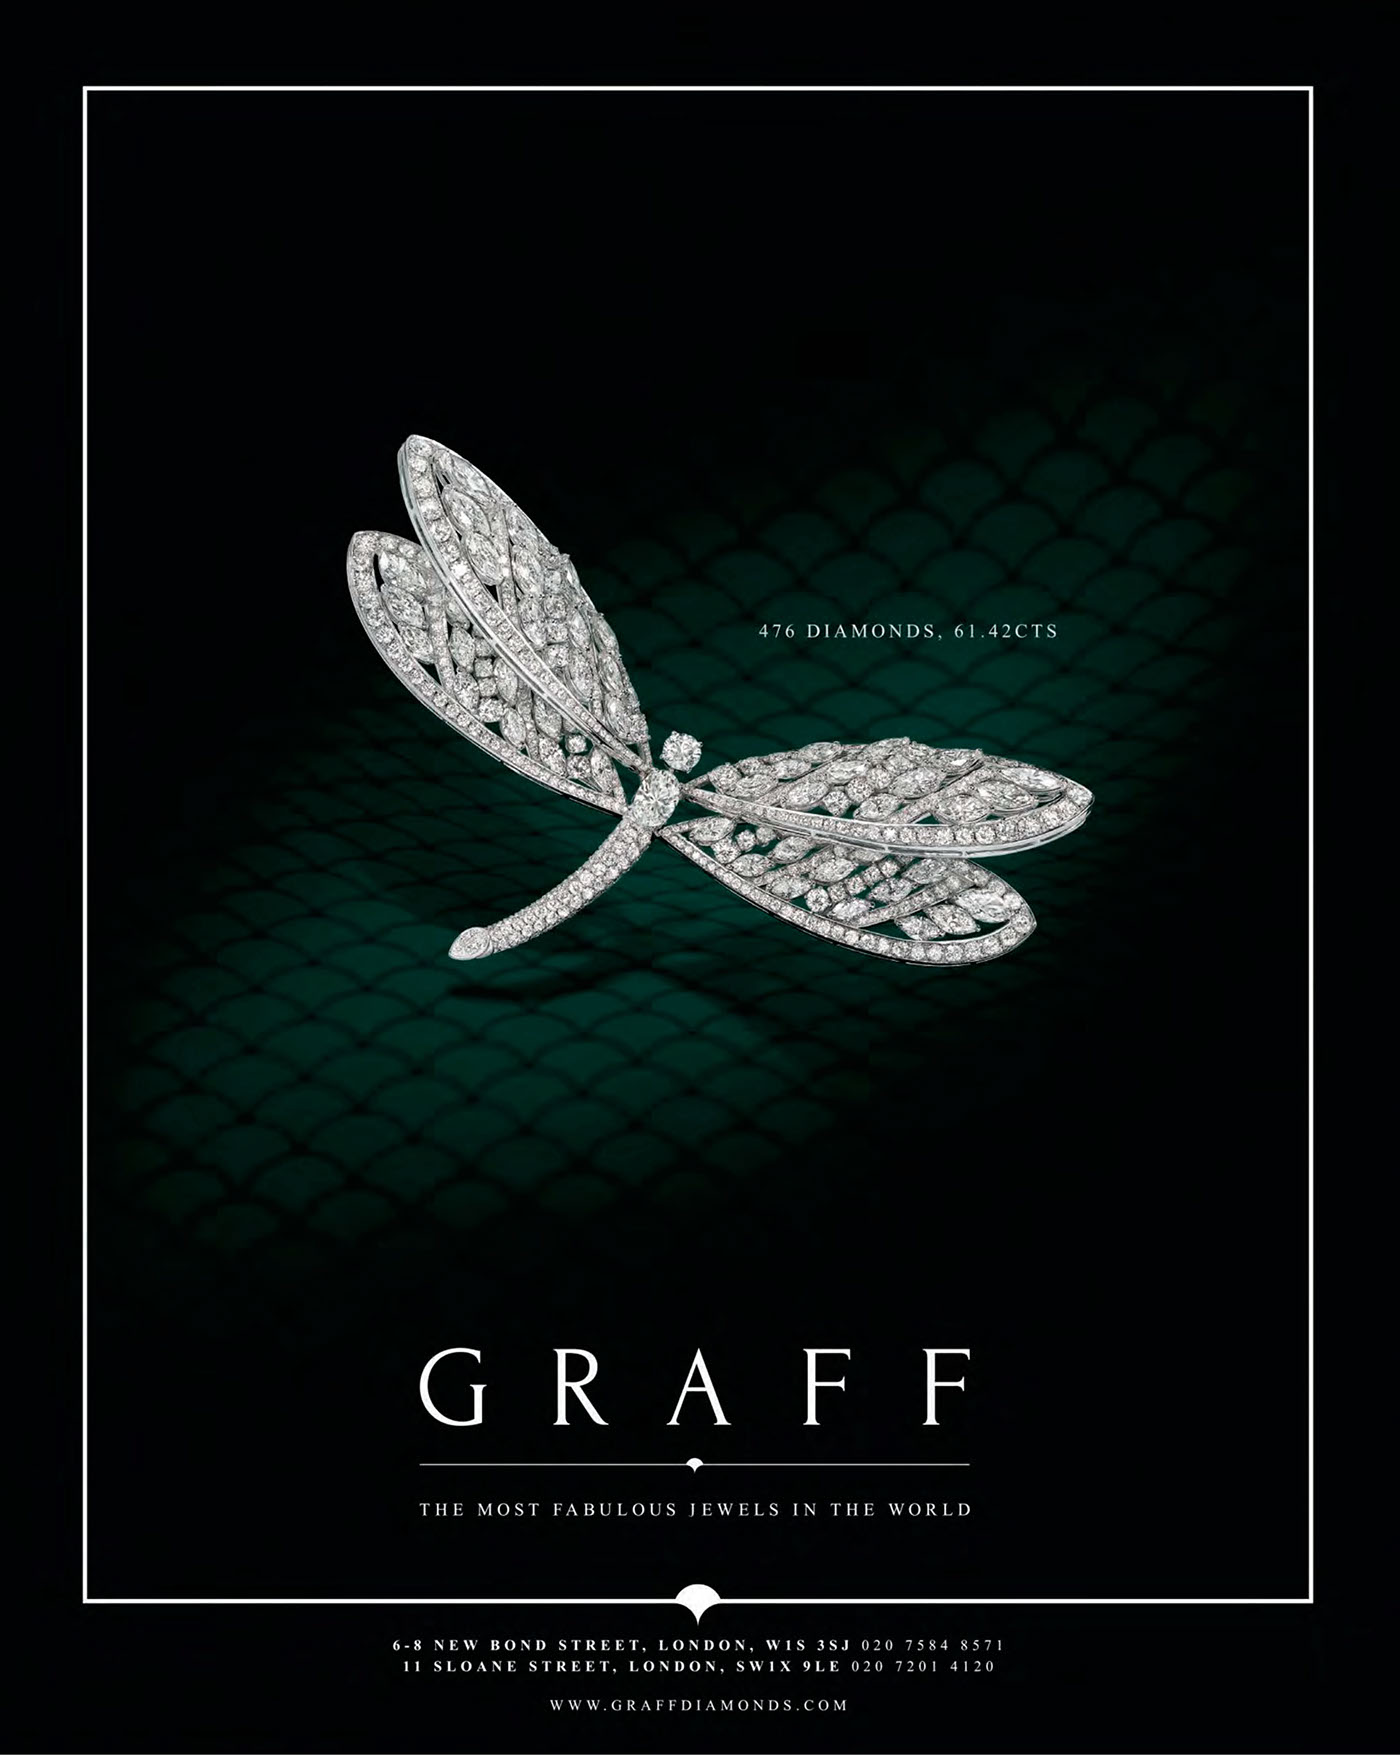 Poster design w graff - Poster Design W Graff 10